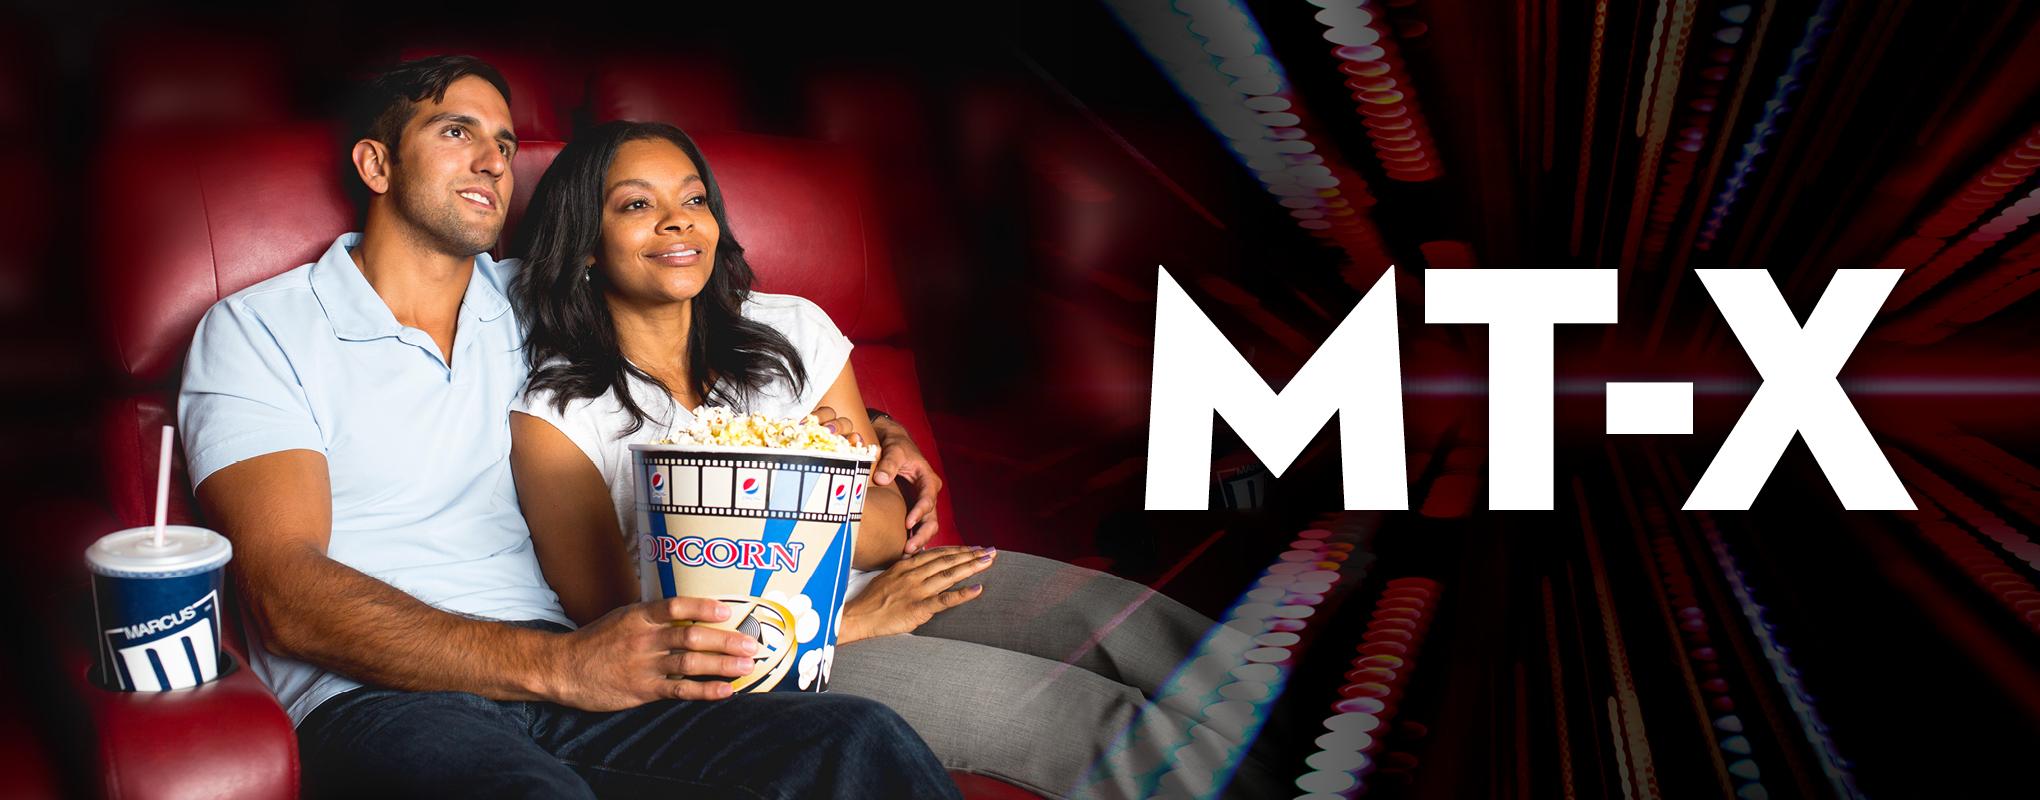 Movie Tavern XTreme